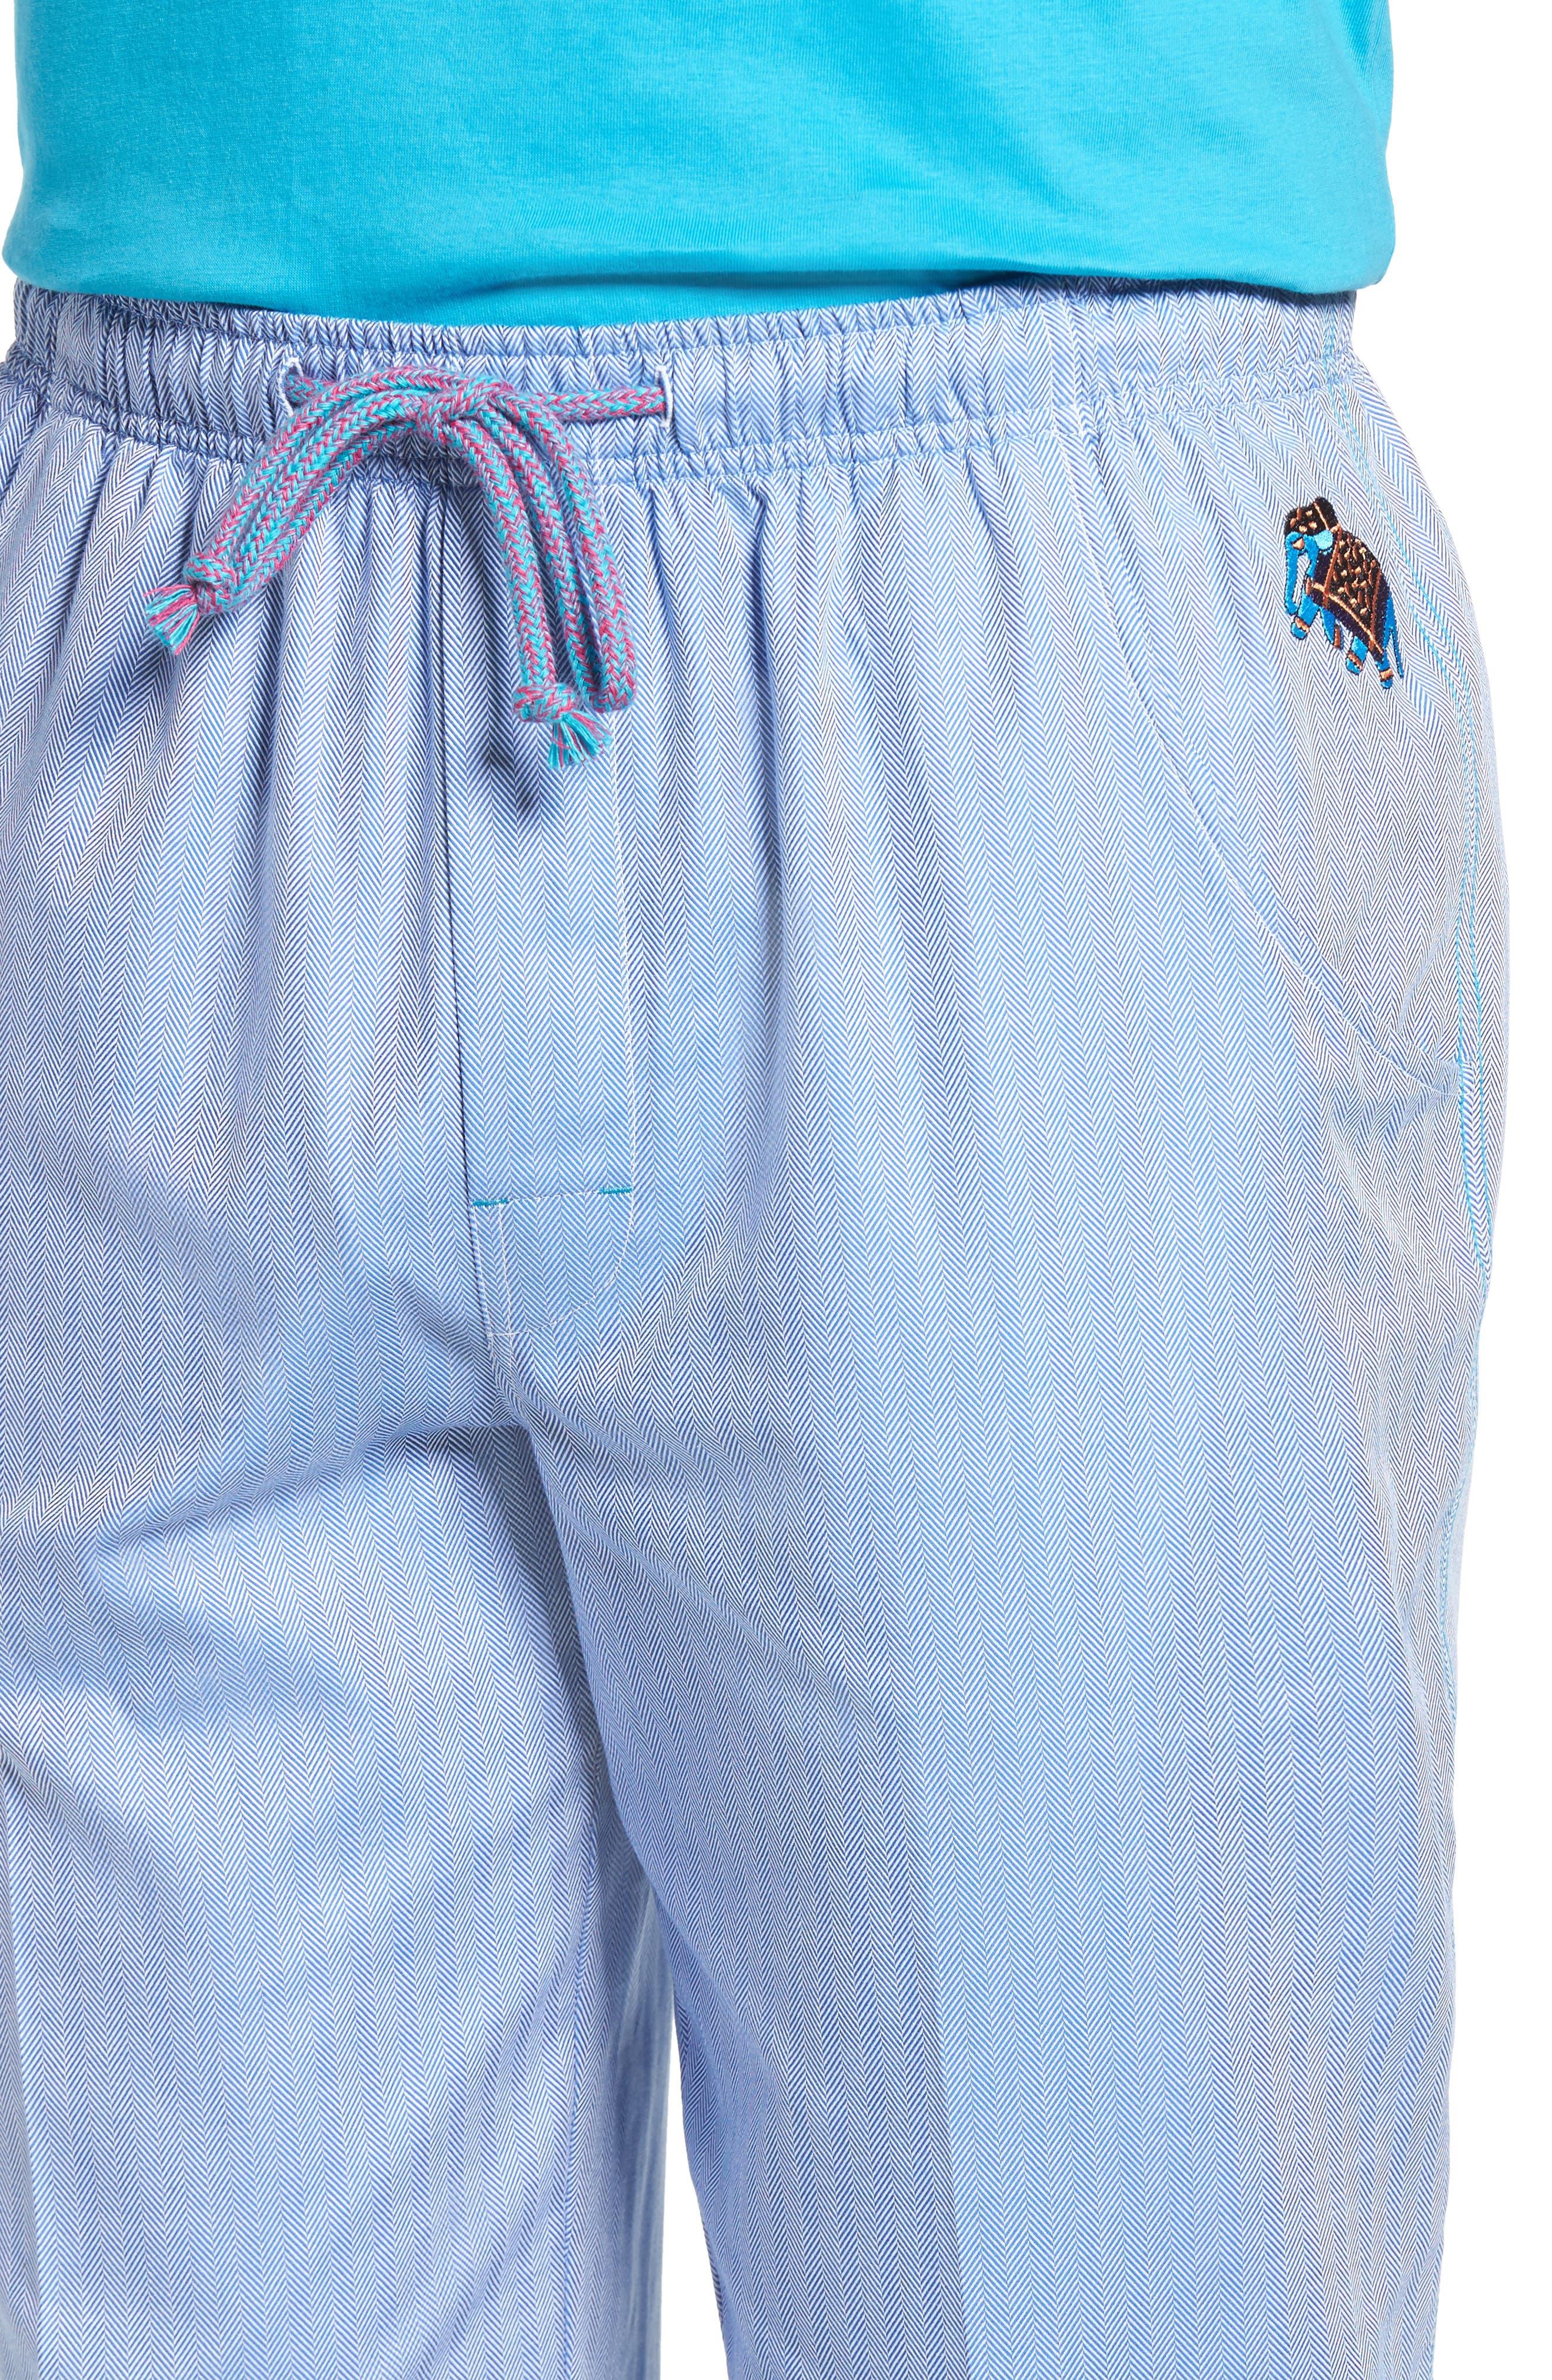 Fusion Pajama Set,                             Alternate thumbnail 4, color,                             439